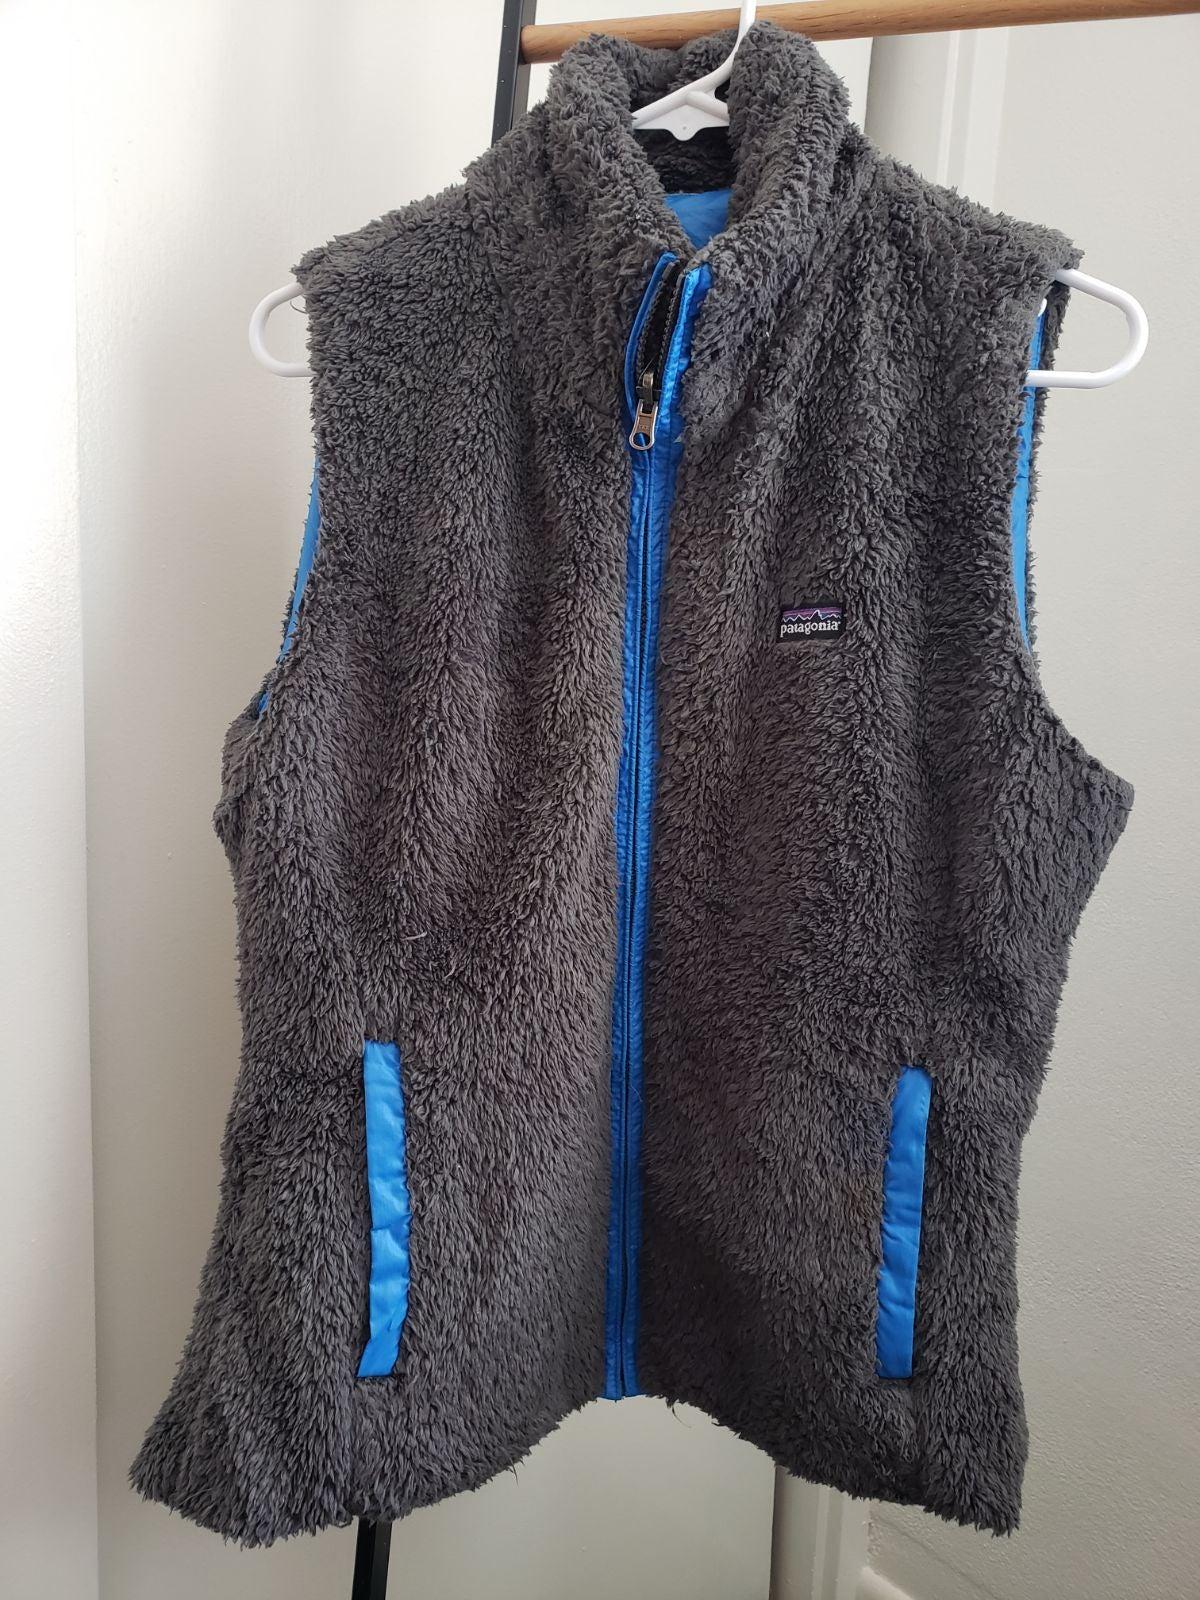 Patagonia Womens Reversible Vest (Large)